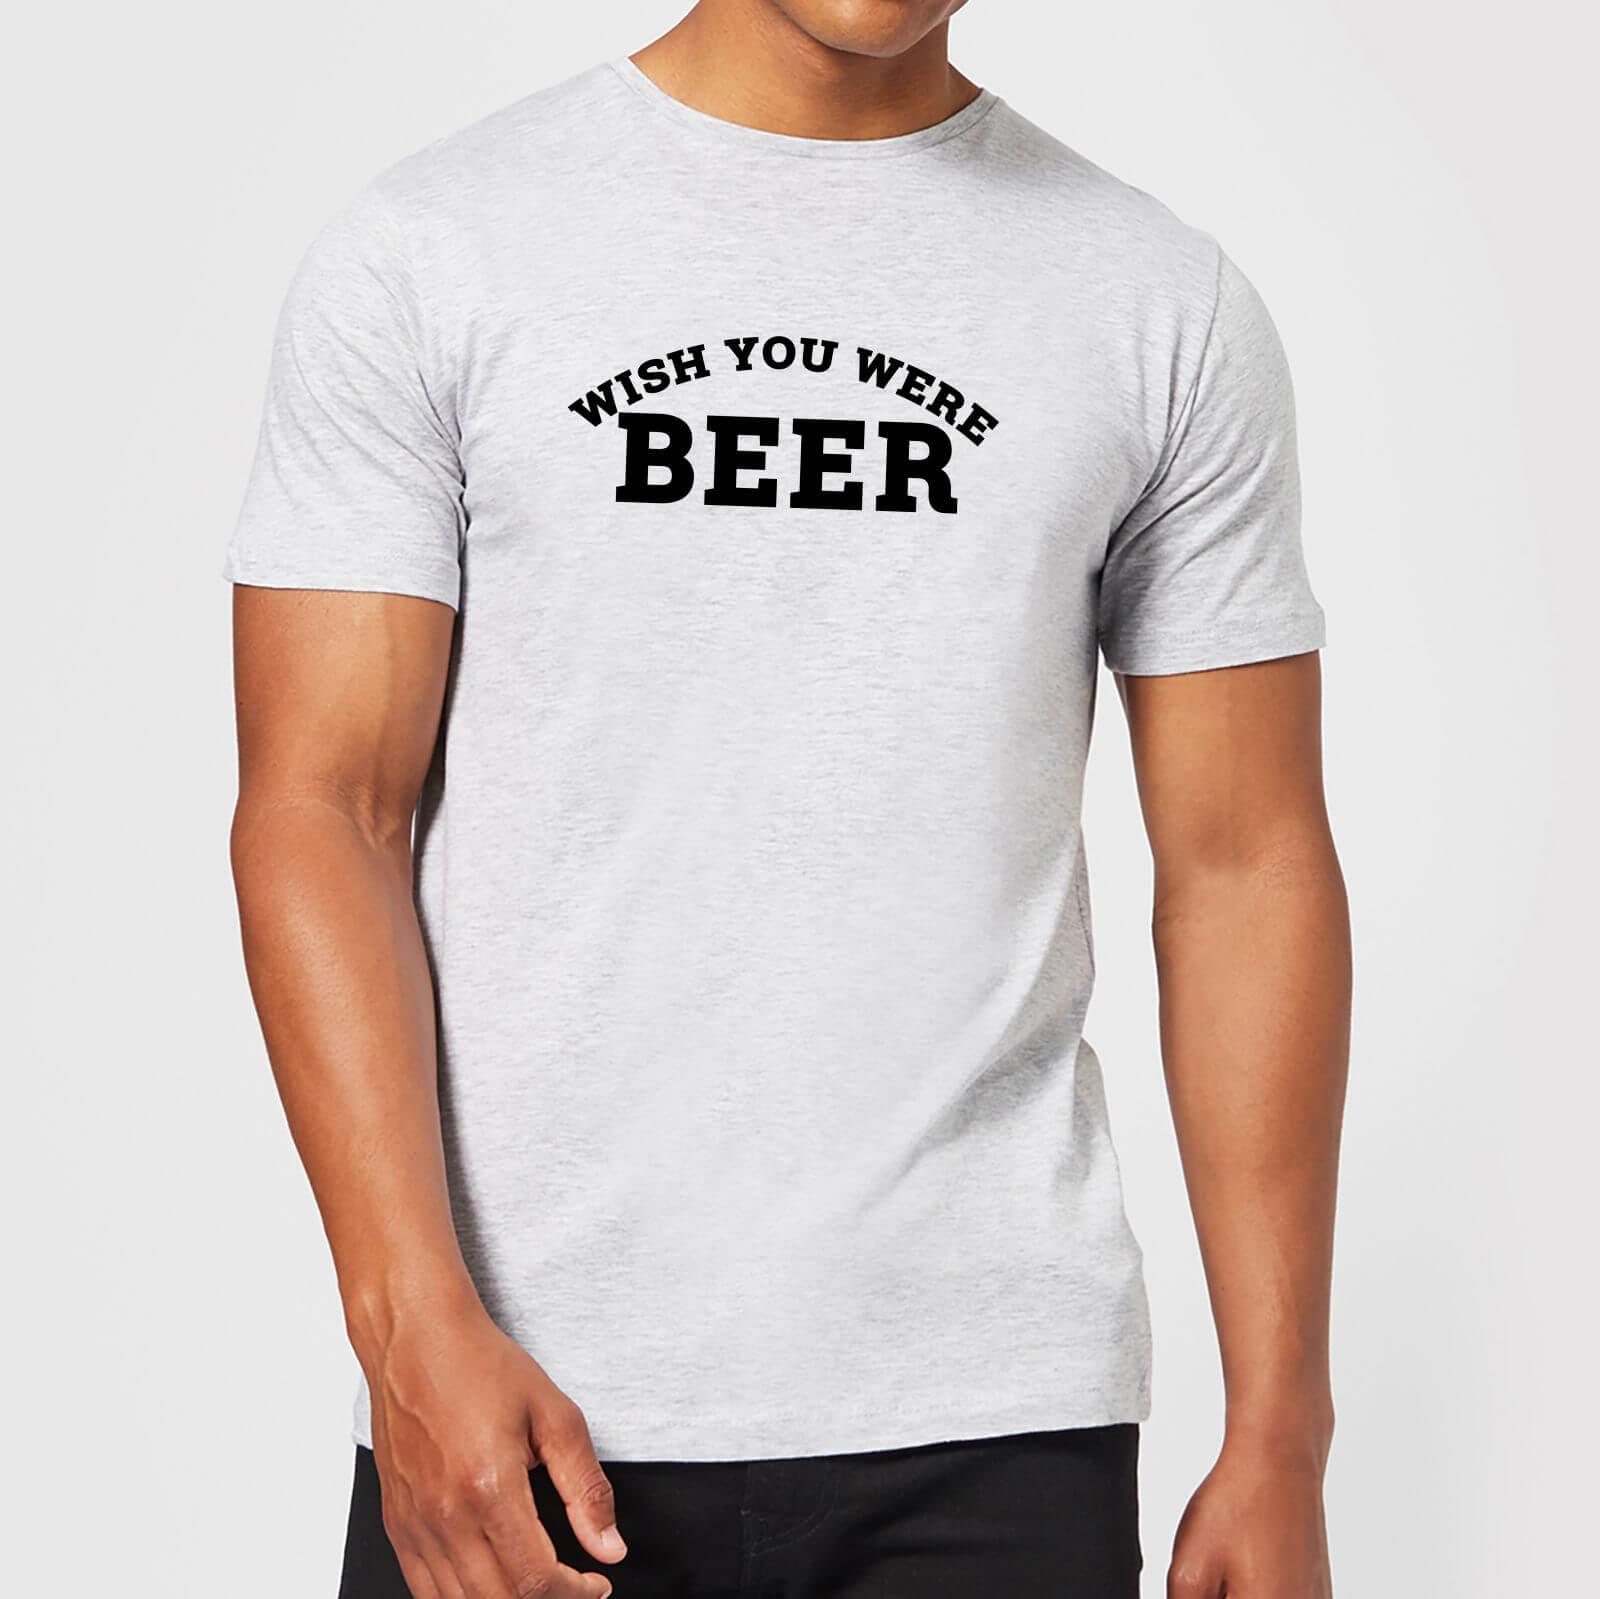 ceef0f5314ed Beershield Wish You Were Beer Men's T-Shirt | IWOOT